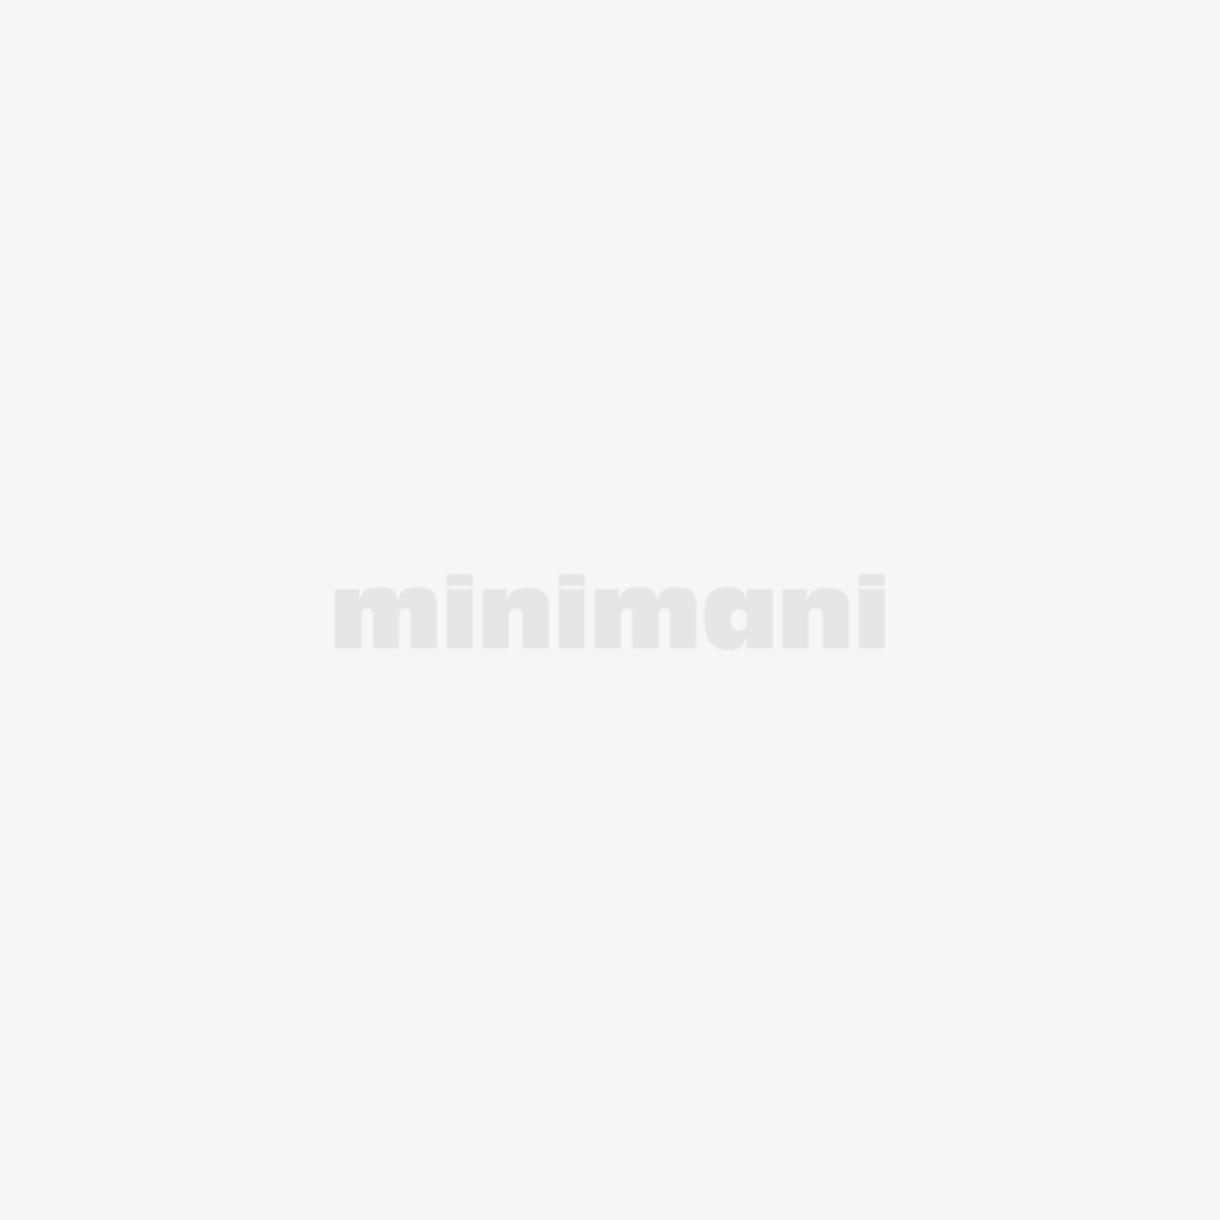 TASTY WILDLIFE RUOKA/JUOMA-AUTOMAATTI 1,5L